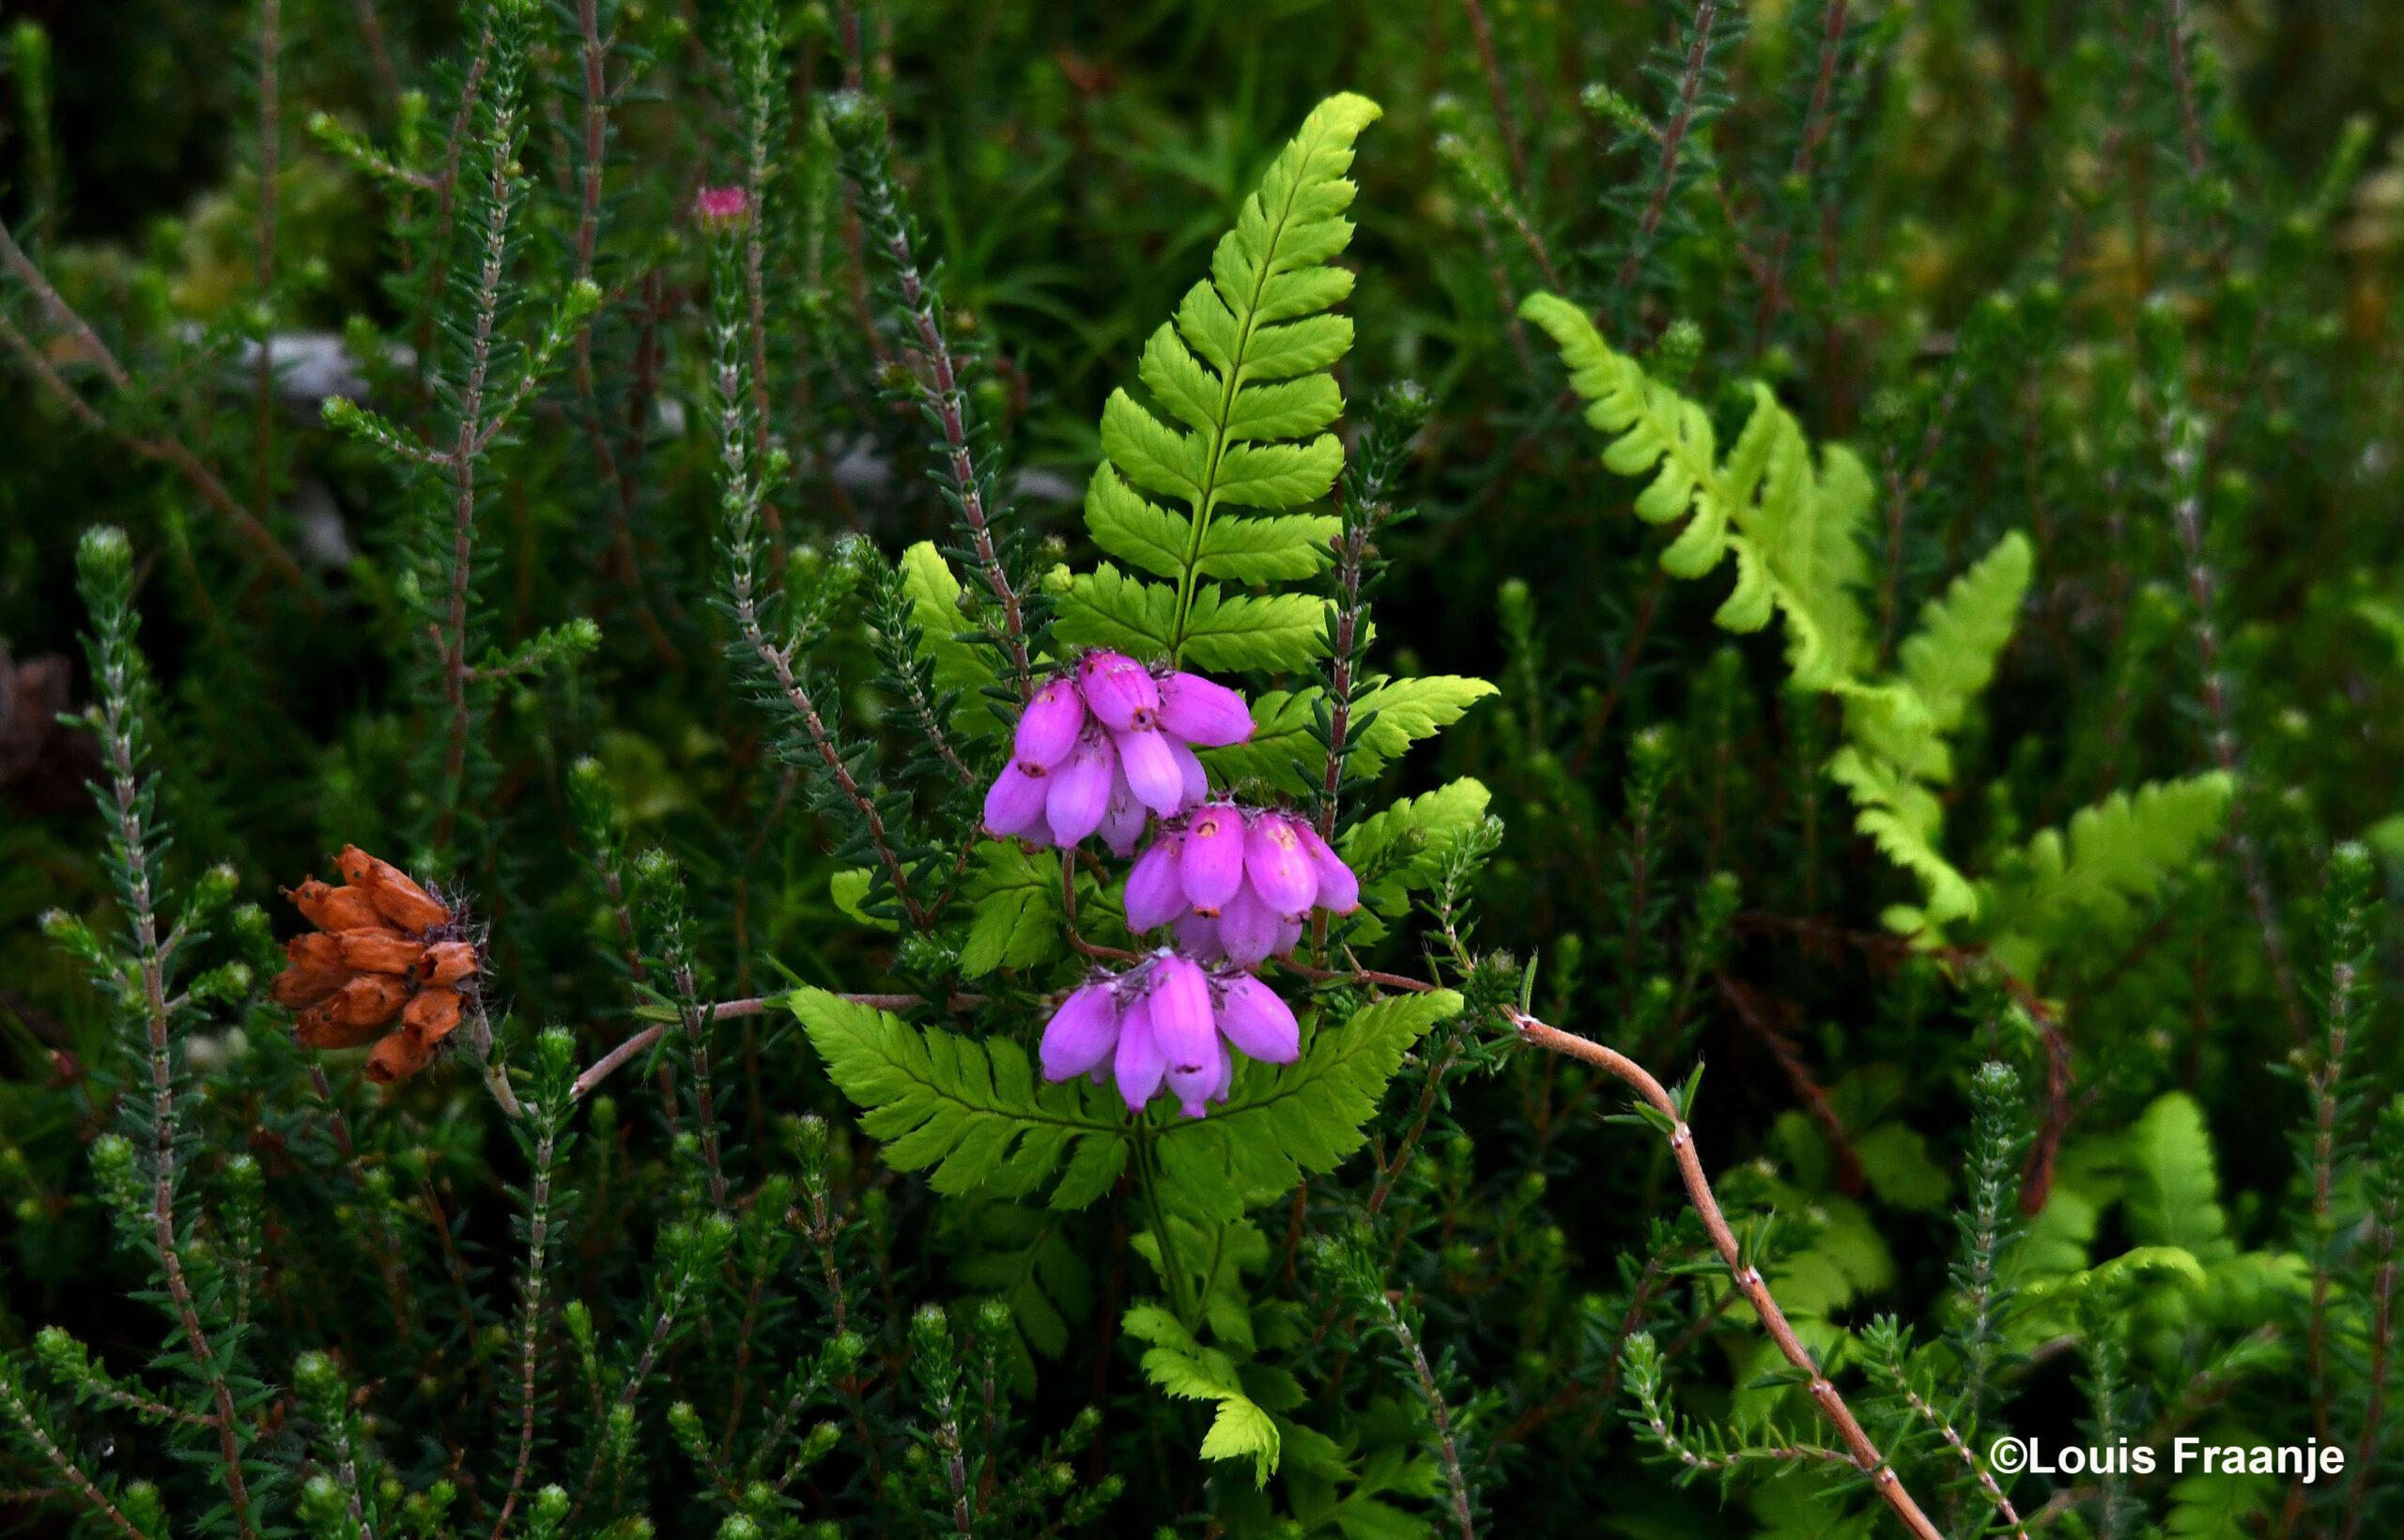 en schitterend paars 'pareltje' tussen het groen naast ons wandelpad - Foto: ©Louis Fraanje